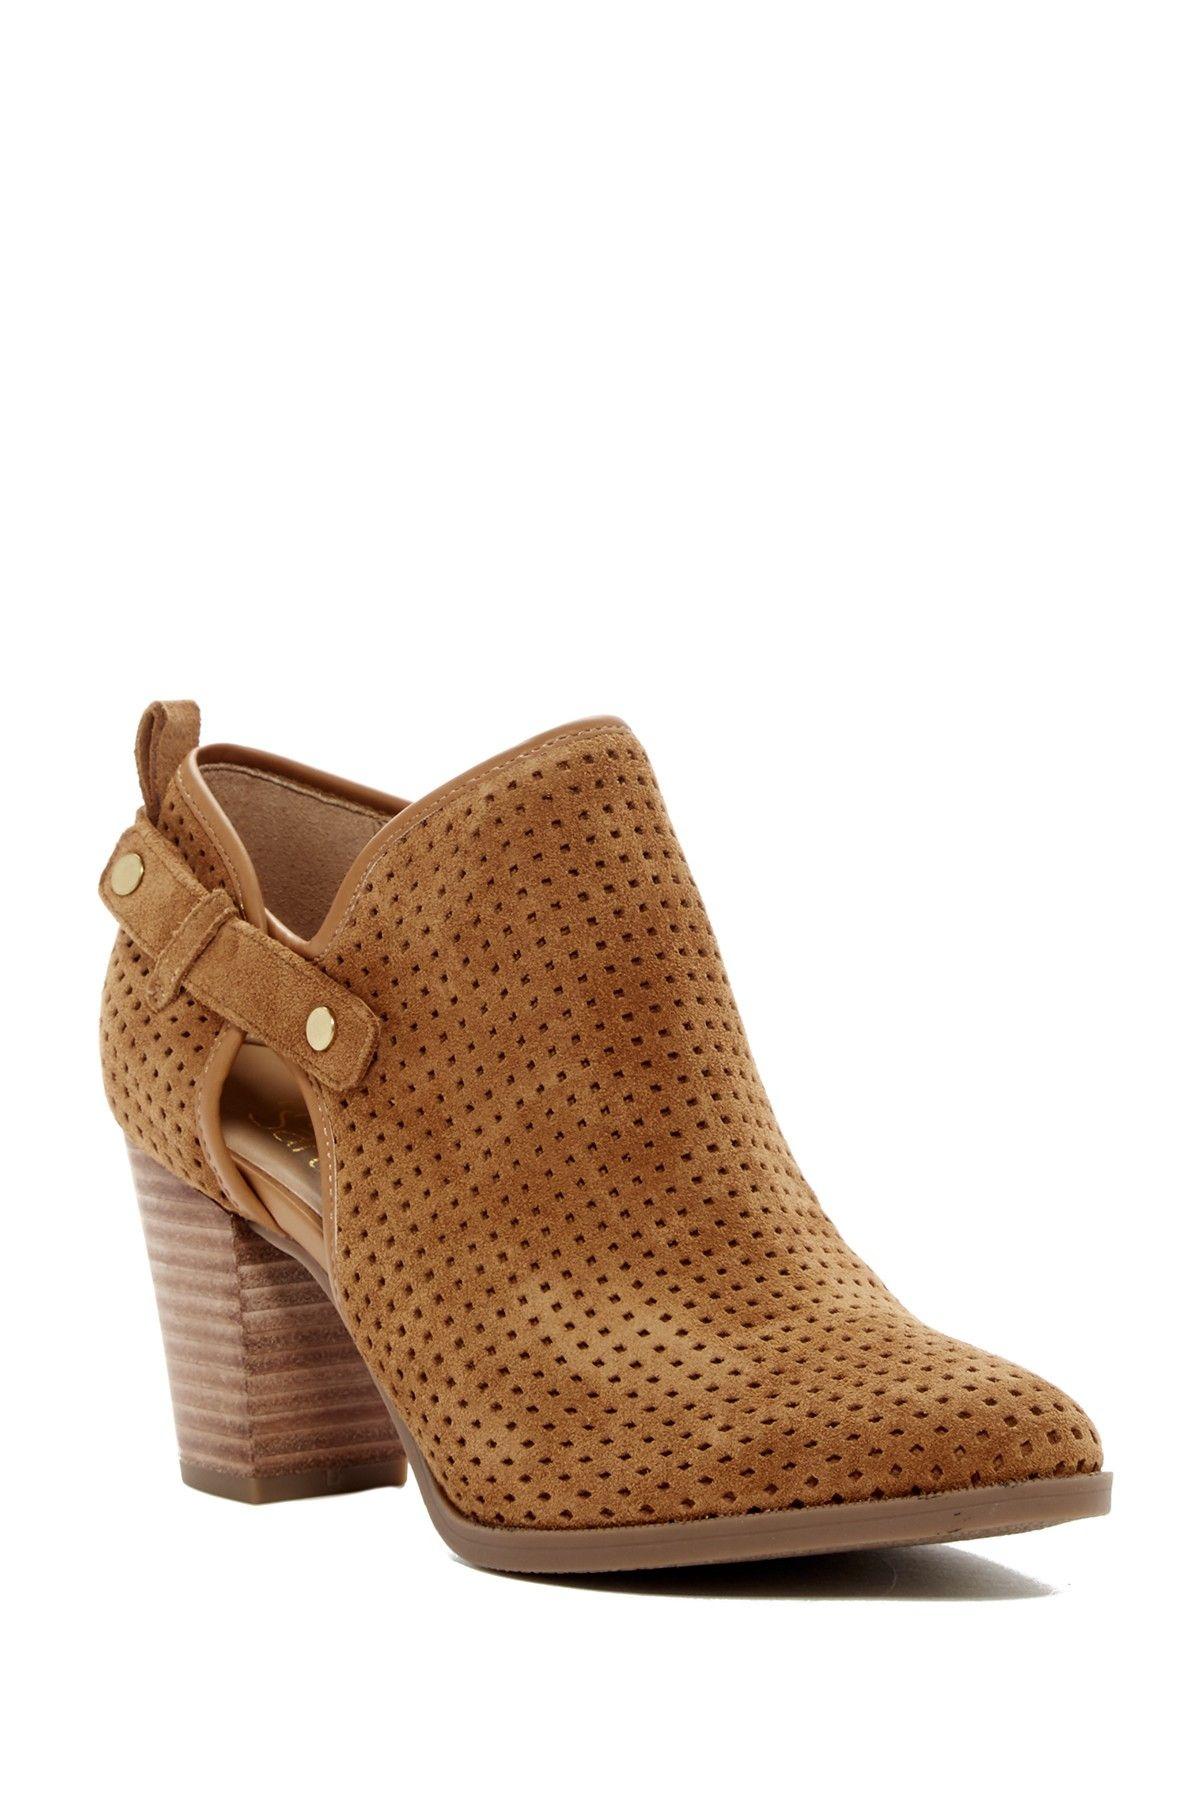 bcbdba61273e Dakota Perforated Bootie Women s Boots